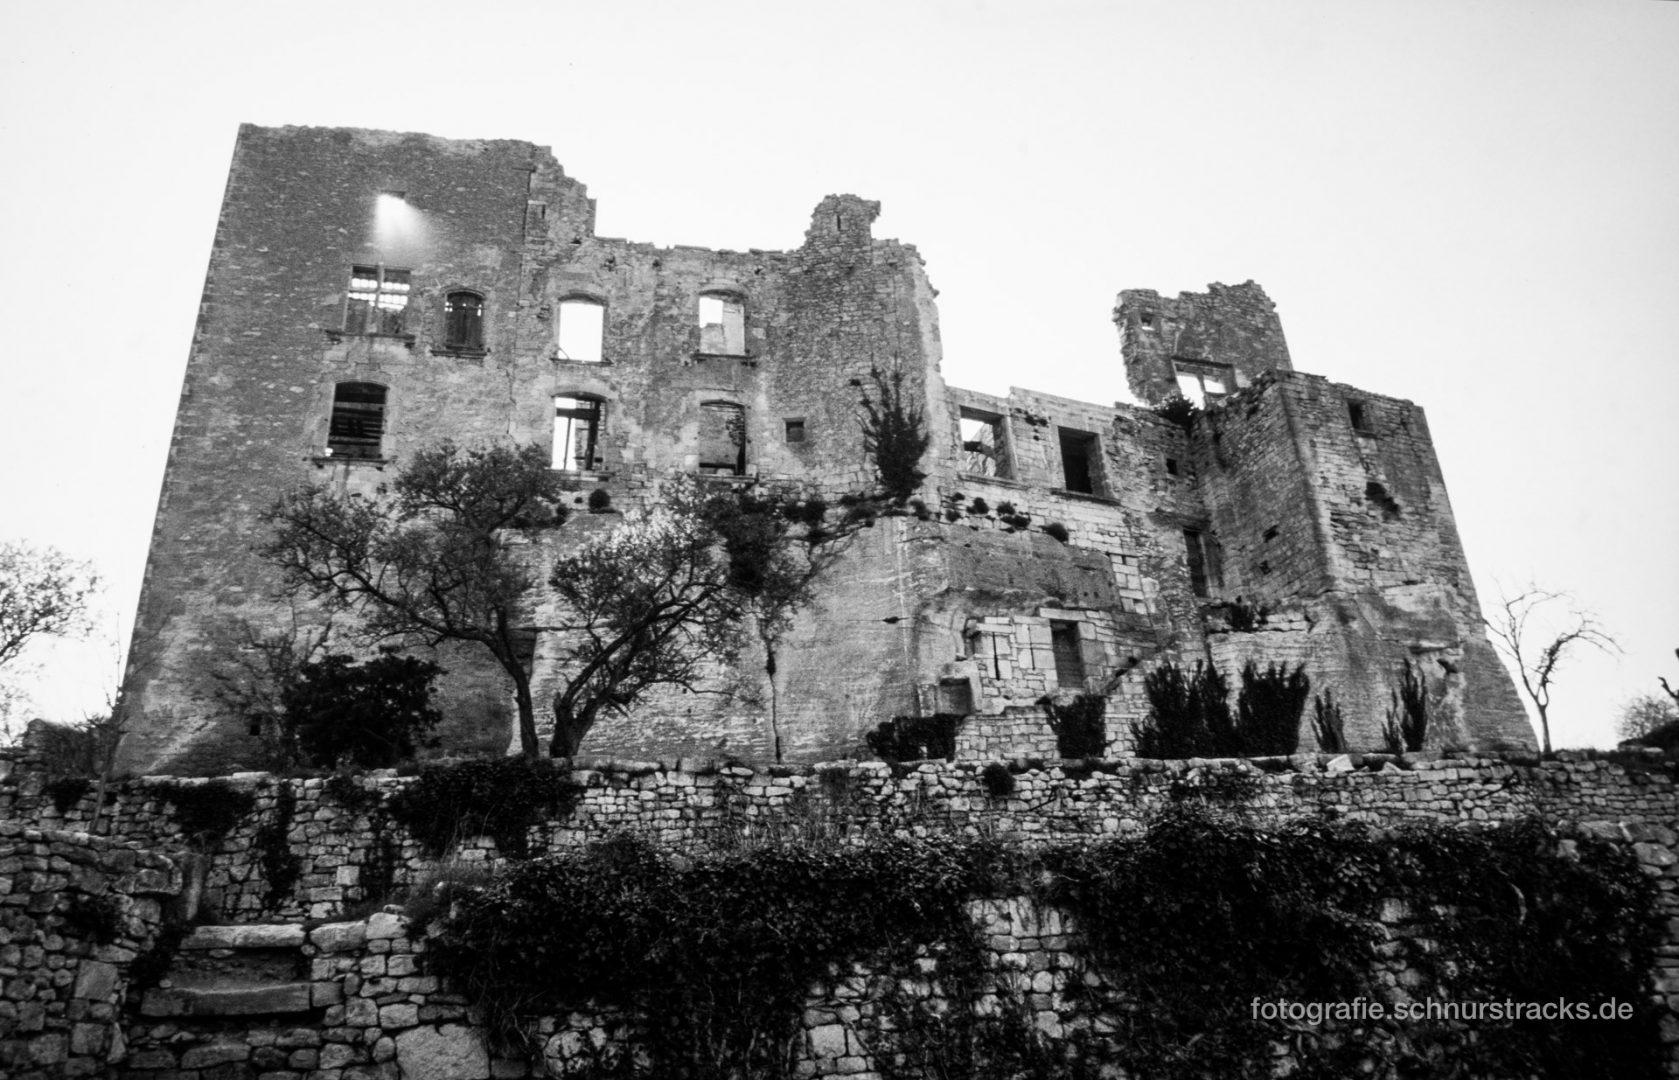 Château de Lacoste – Vaucluse #0623